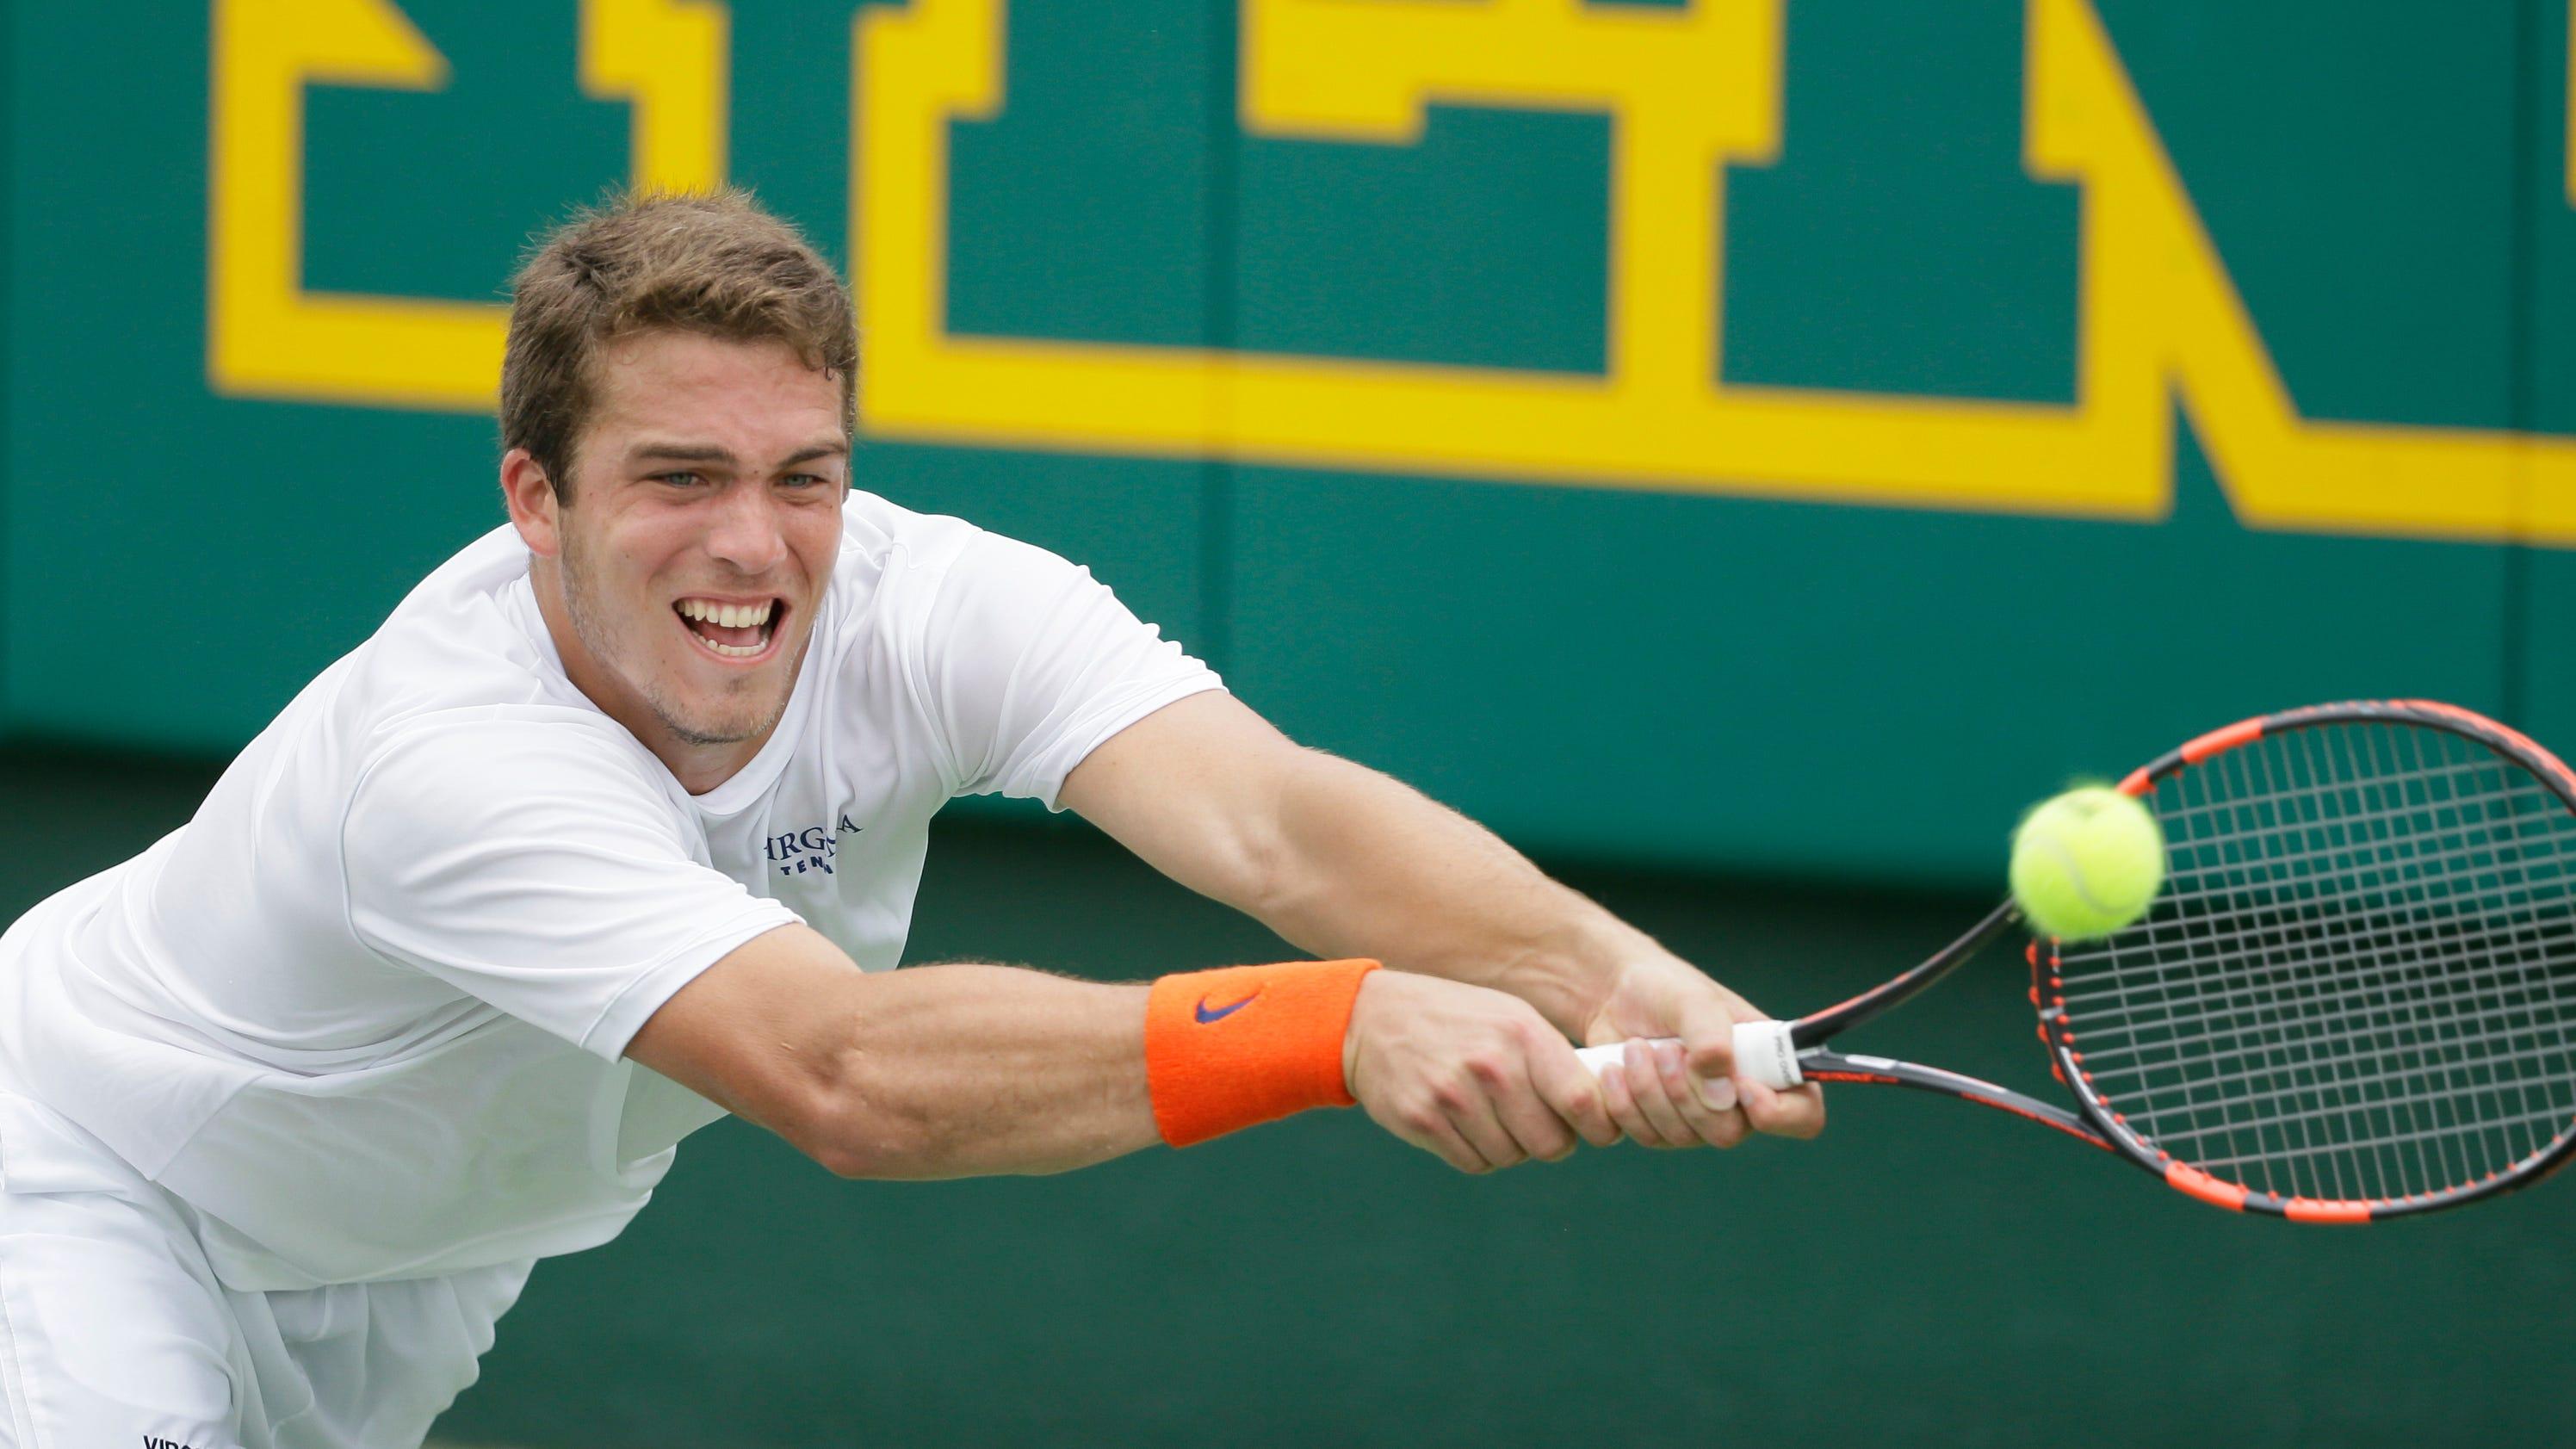 Virginia takes 2nd NCAA men's team tennis title in 3 years